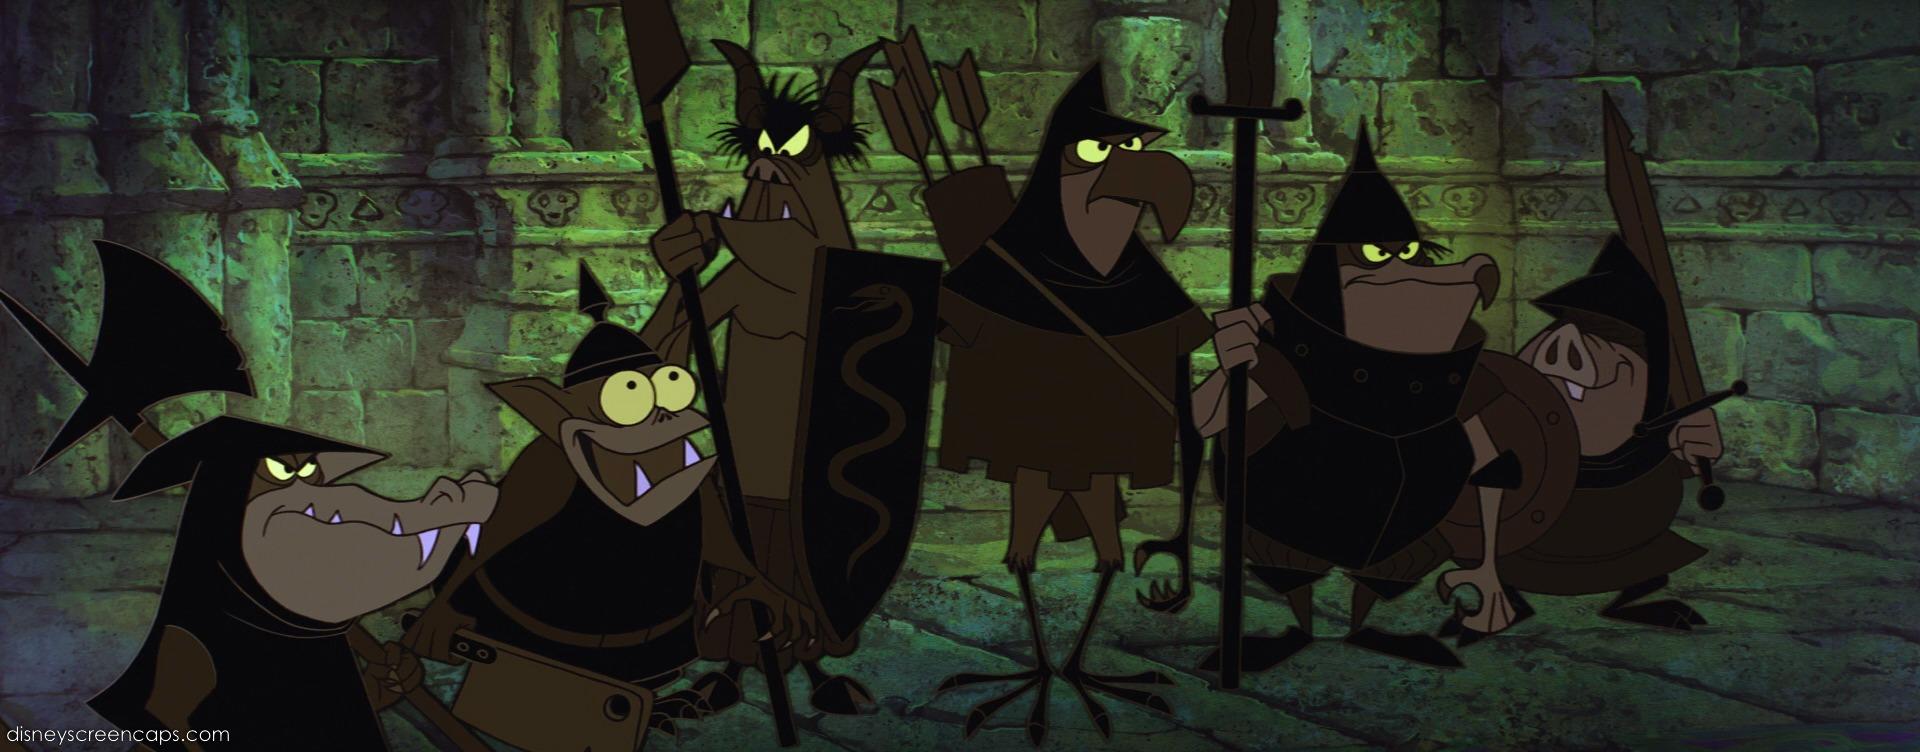 Maleficent S Goons Kingdom Hearts Unlimited Wiki